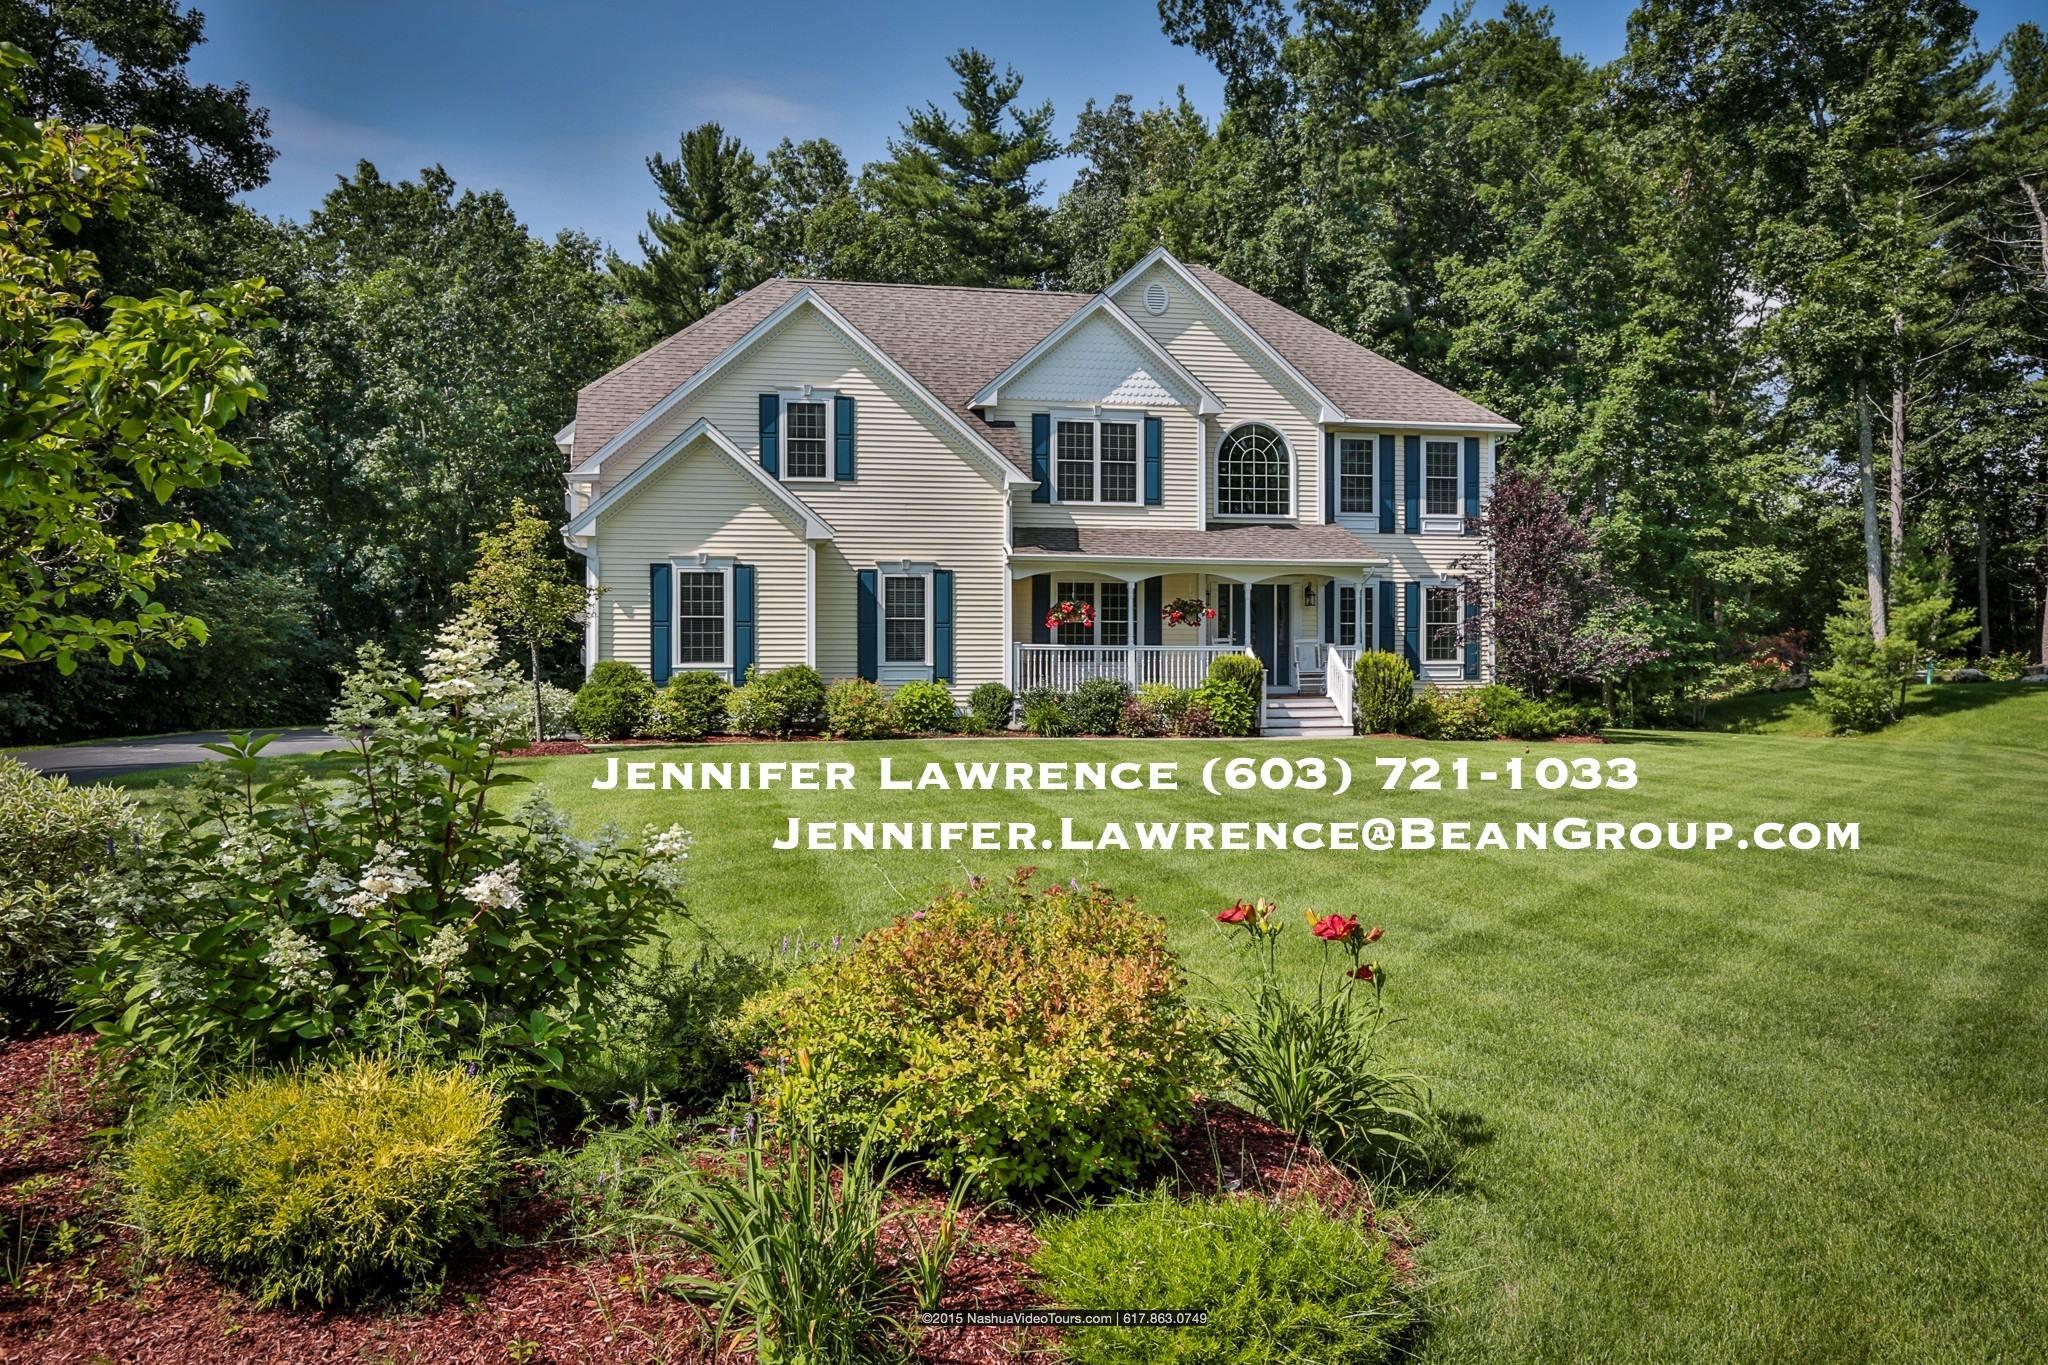 Jennifer Lawrence   Bean Group Real Estate image 0